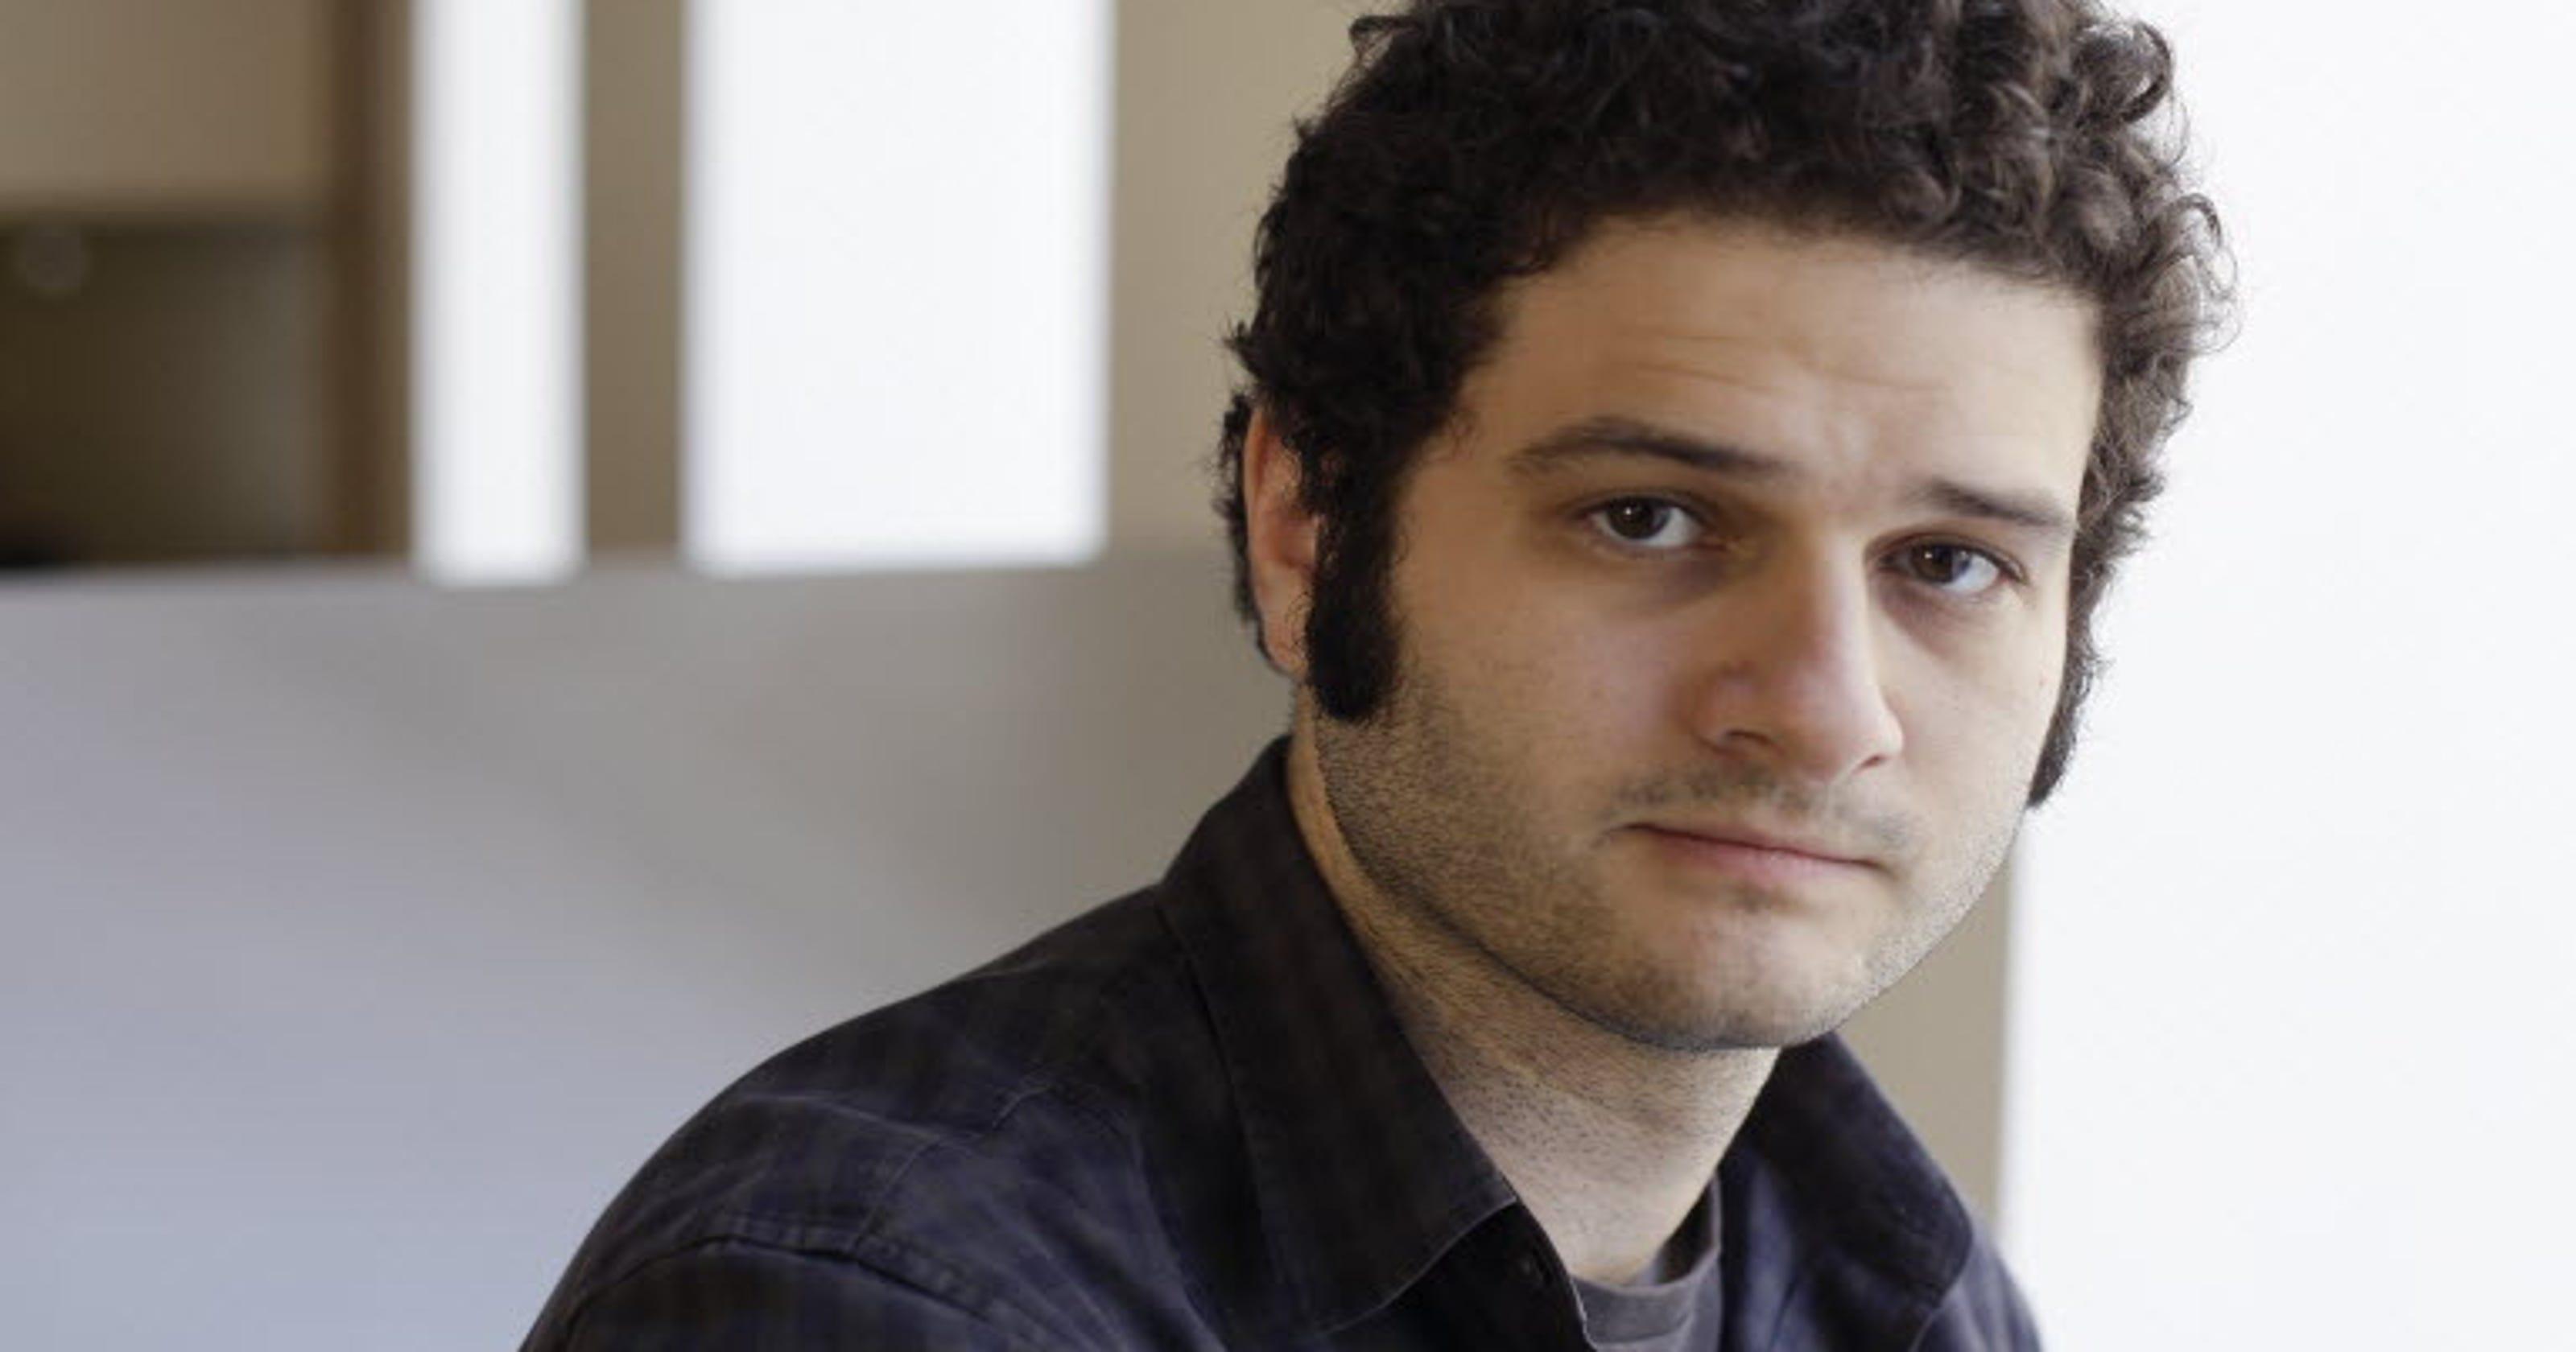 Facebook co-founder Moskovitz: Tech companies risk destroying